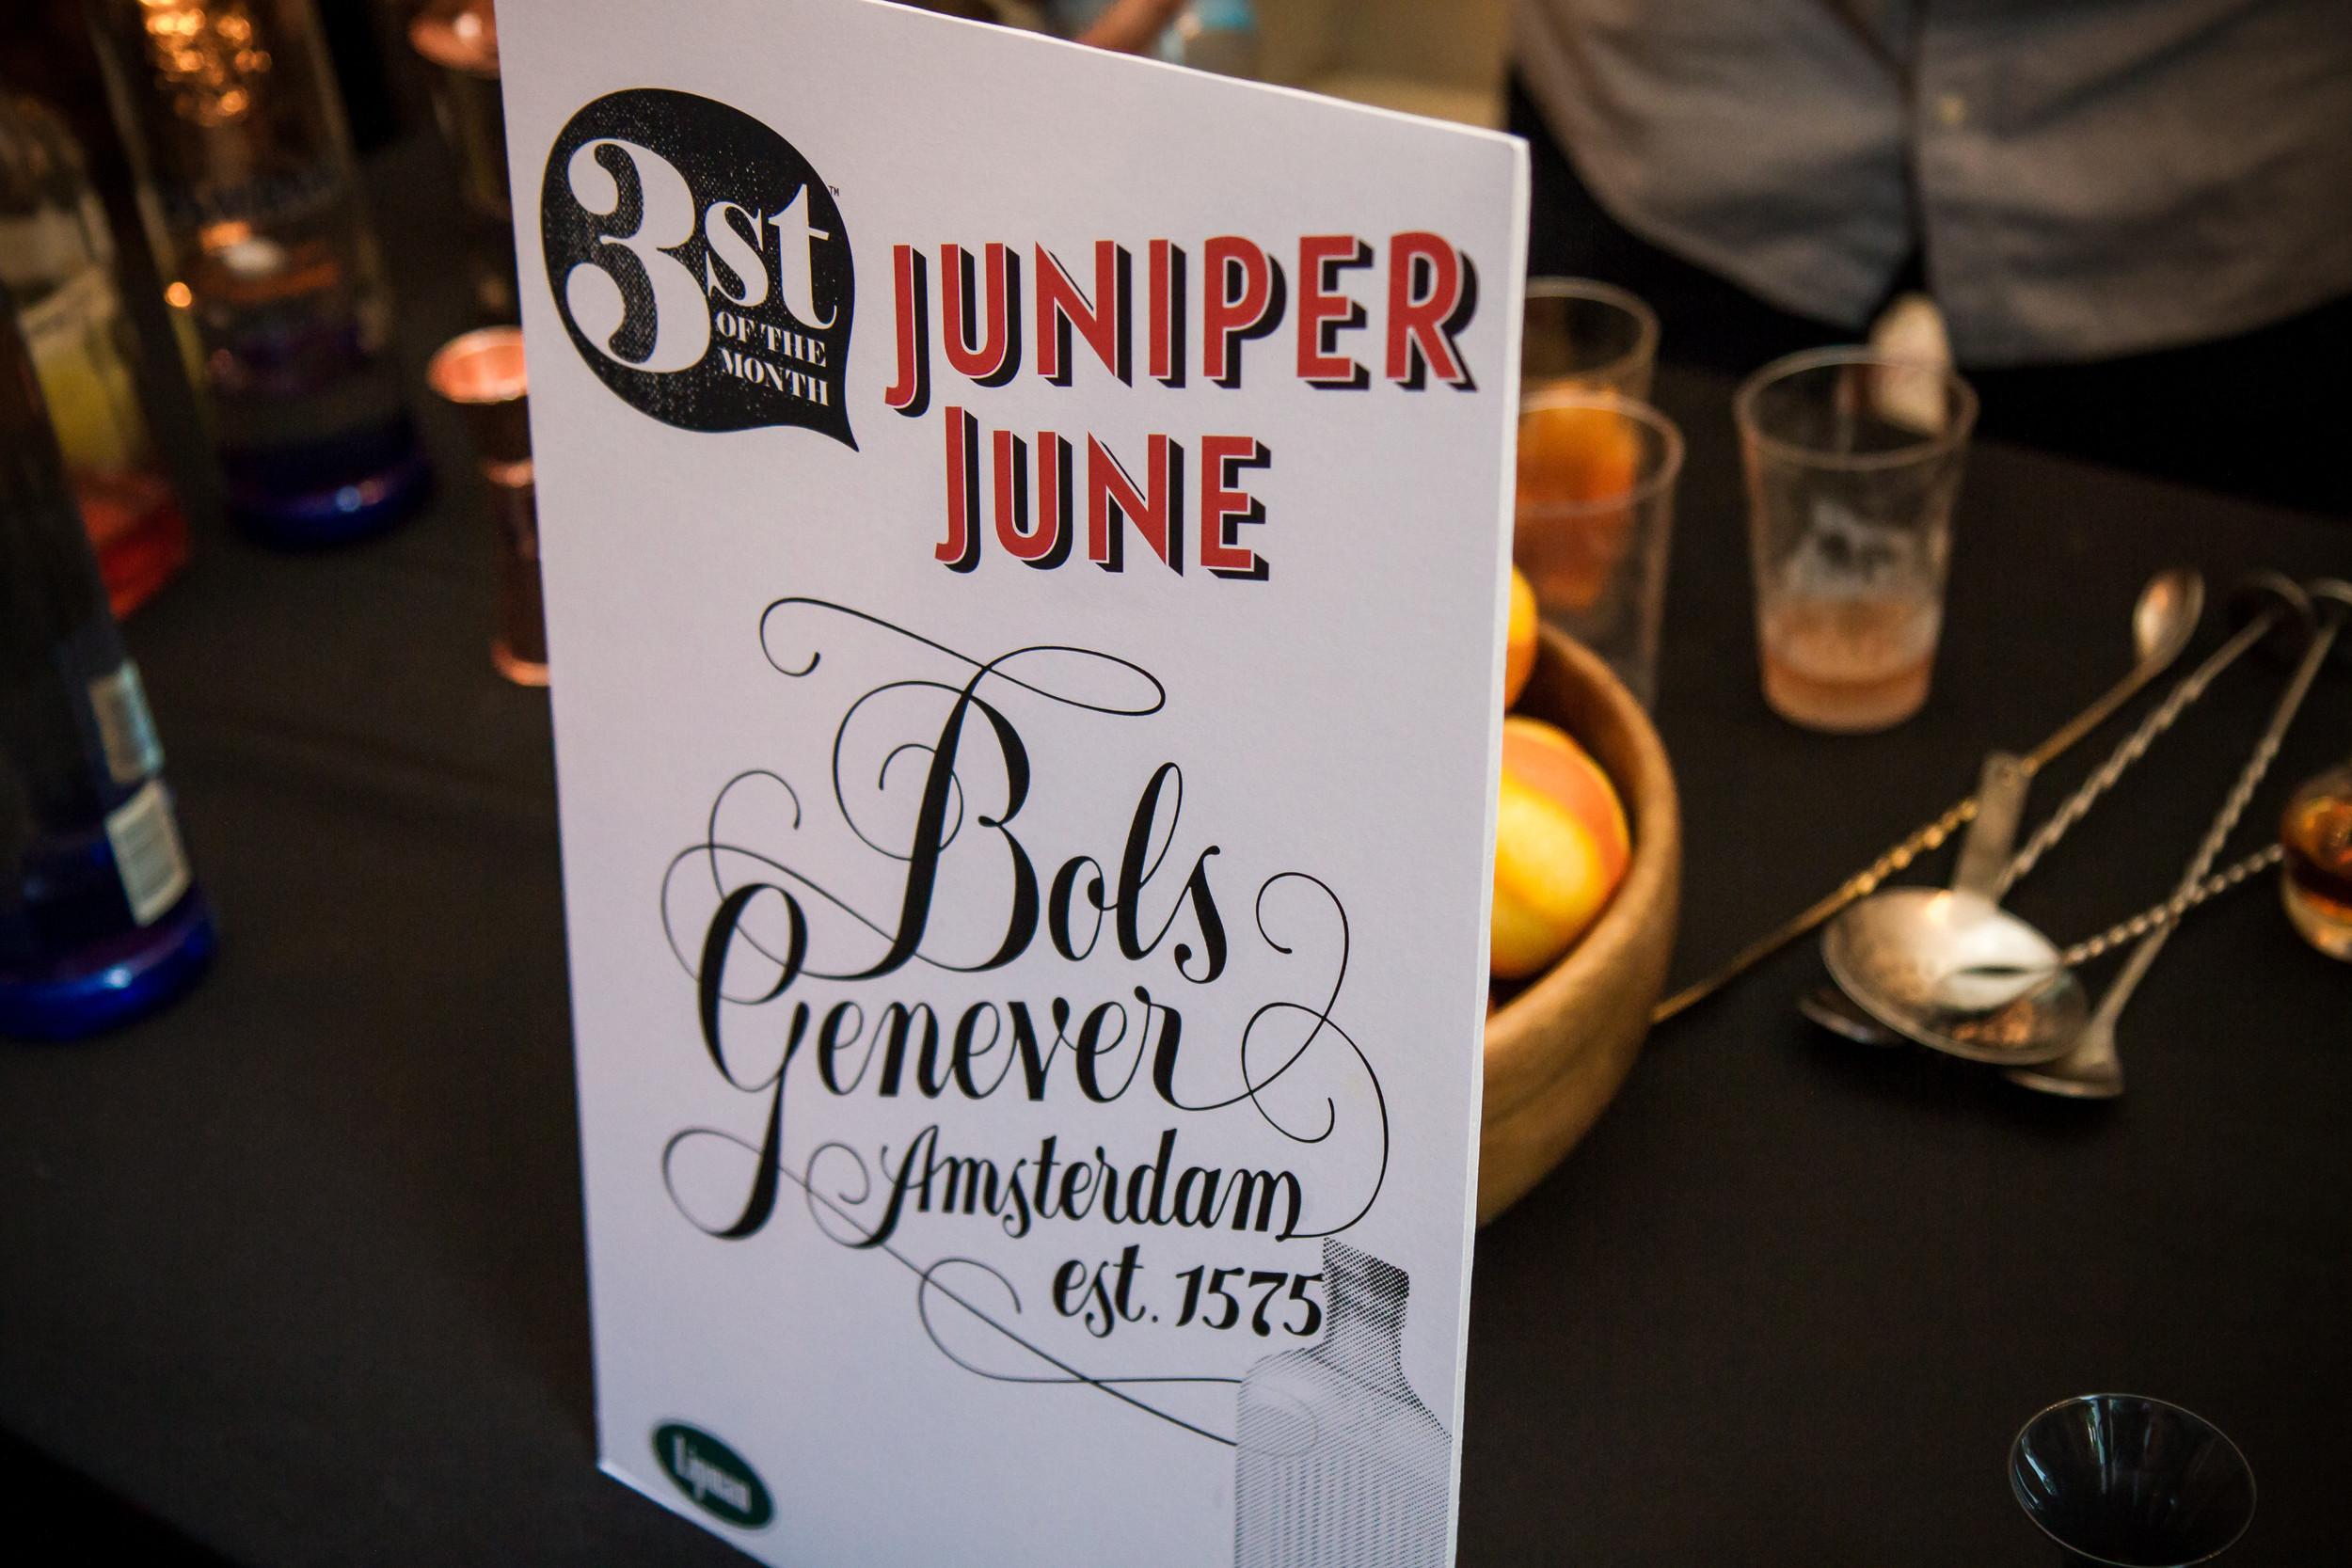 3st of the Month-Juniper June_560.jpg